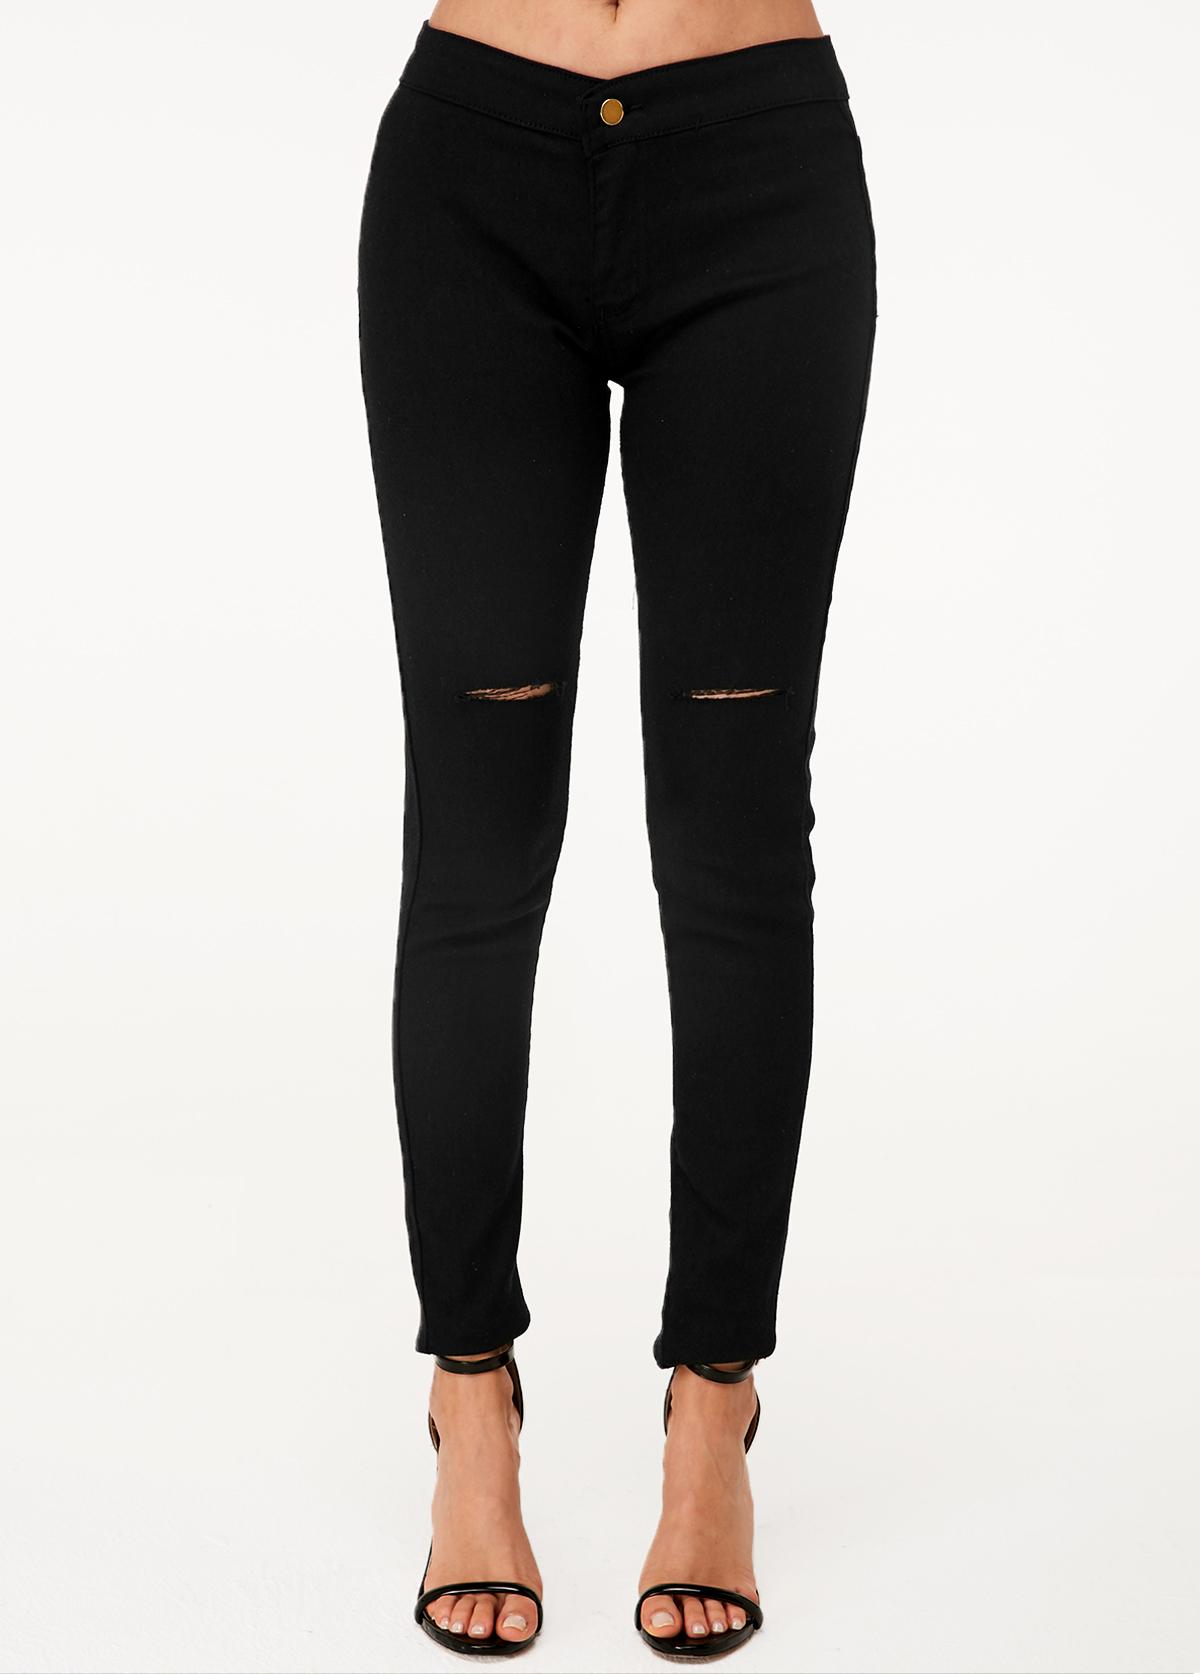 ROTITA Black Shredded High Waist Skinny Jeans